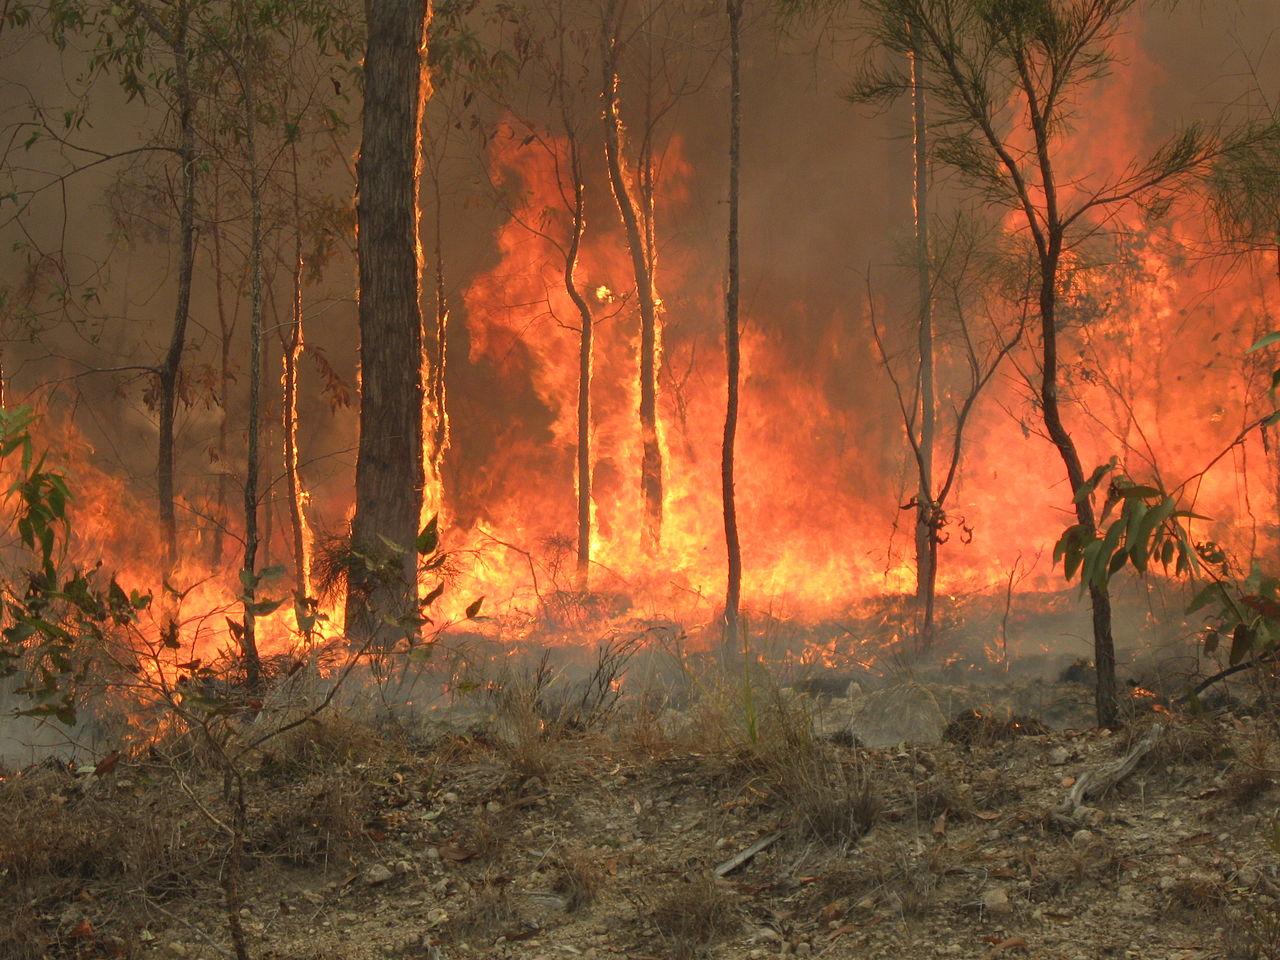 Brushfire in Queensland, Australia Photo:  Wikimedia